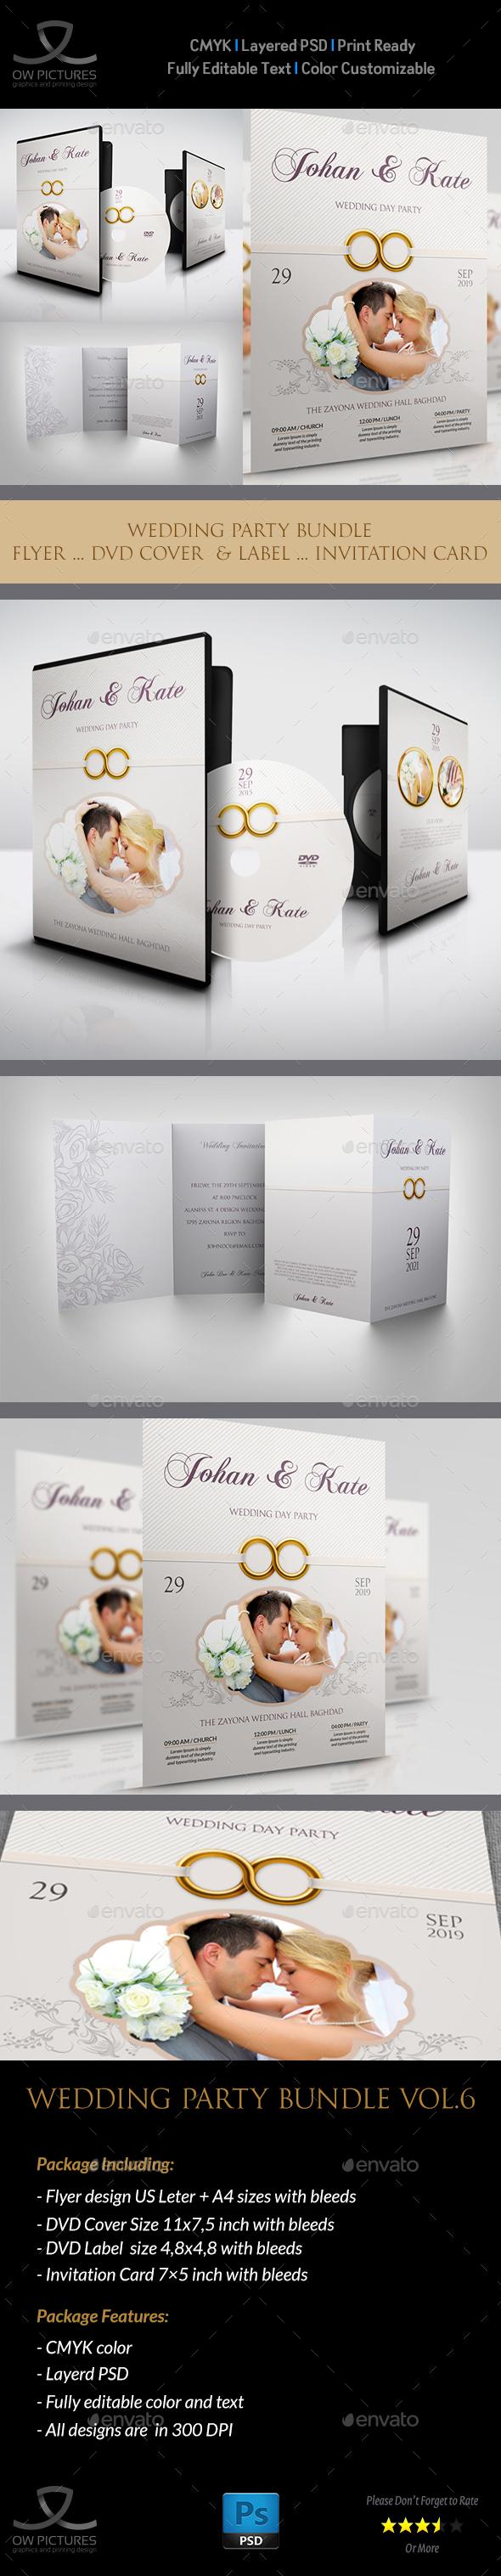 Wedding Party Bundle Vol.7 - Miscellaneous Print Templates